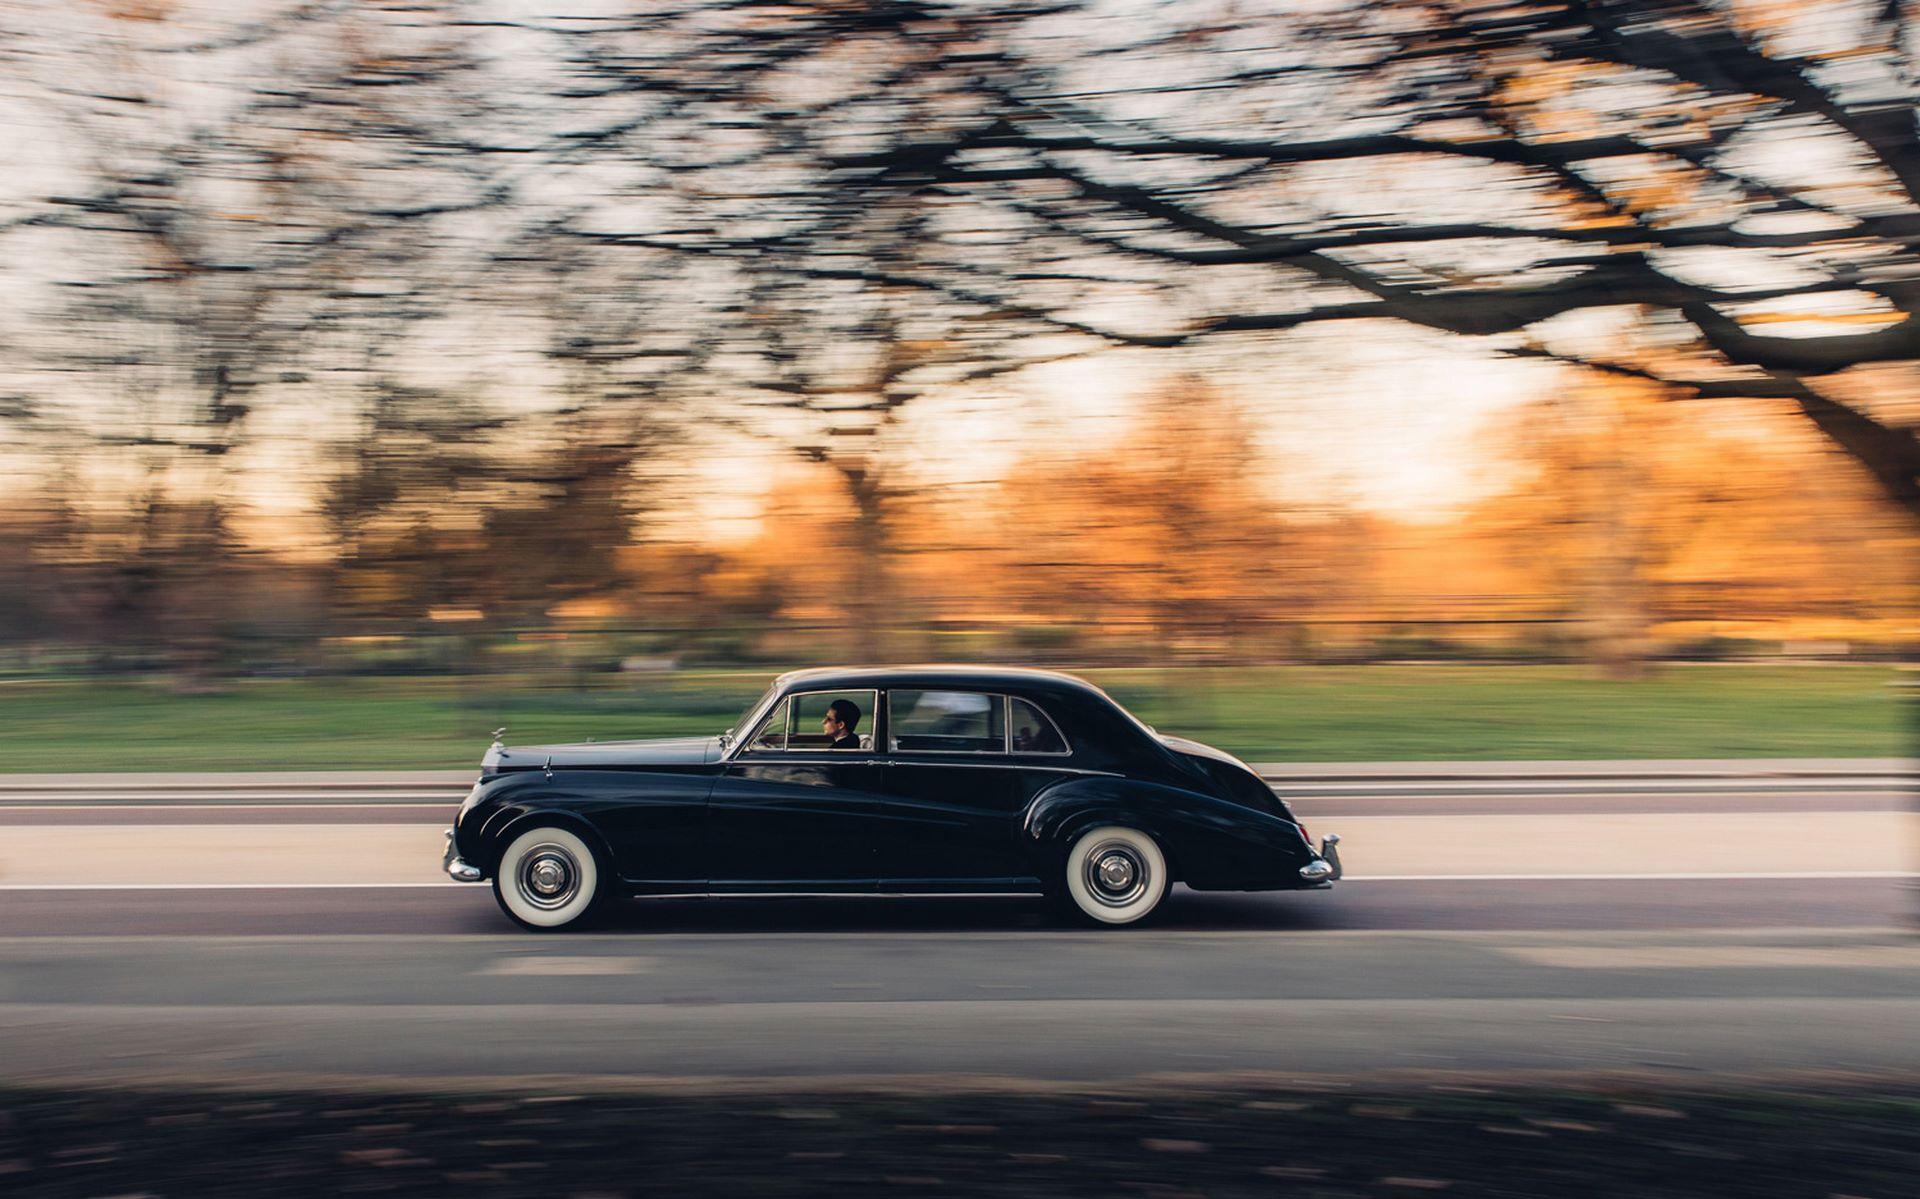 Electris-Rolls-Royce-Phantom-V-and-Silver-Cloud-by-Lunaz-32